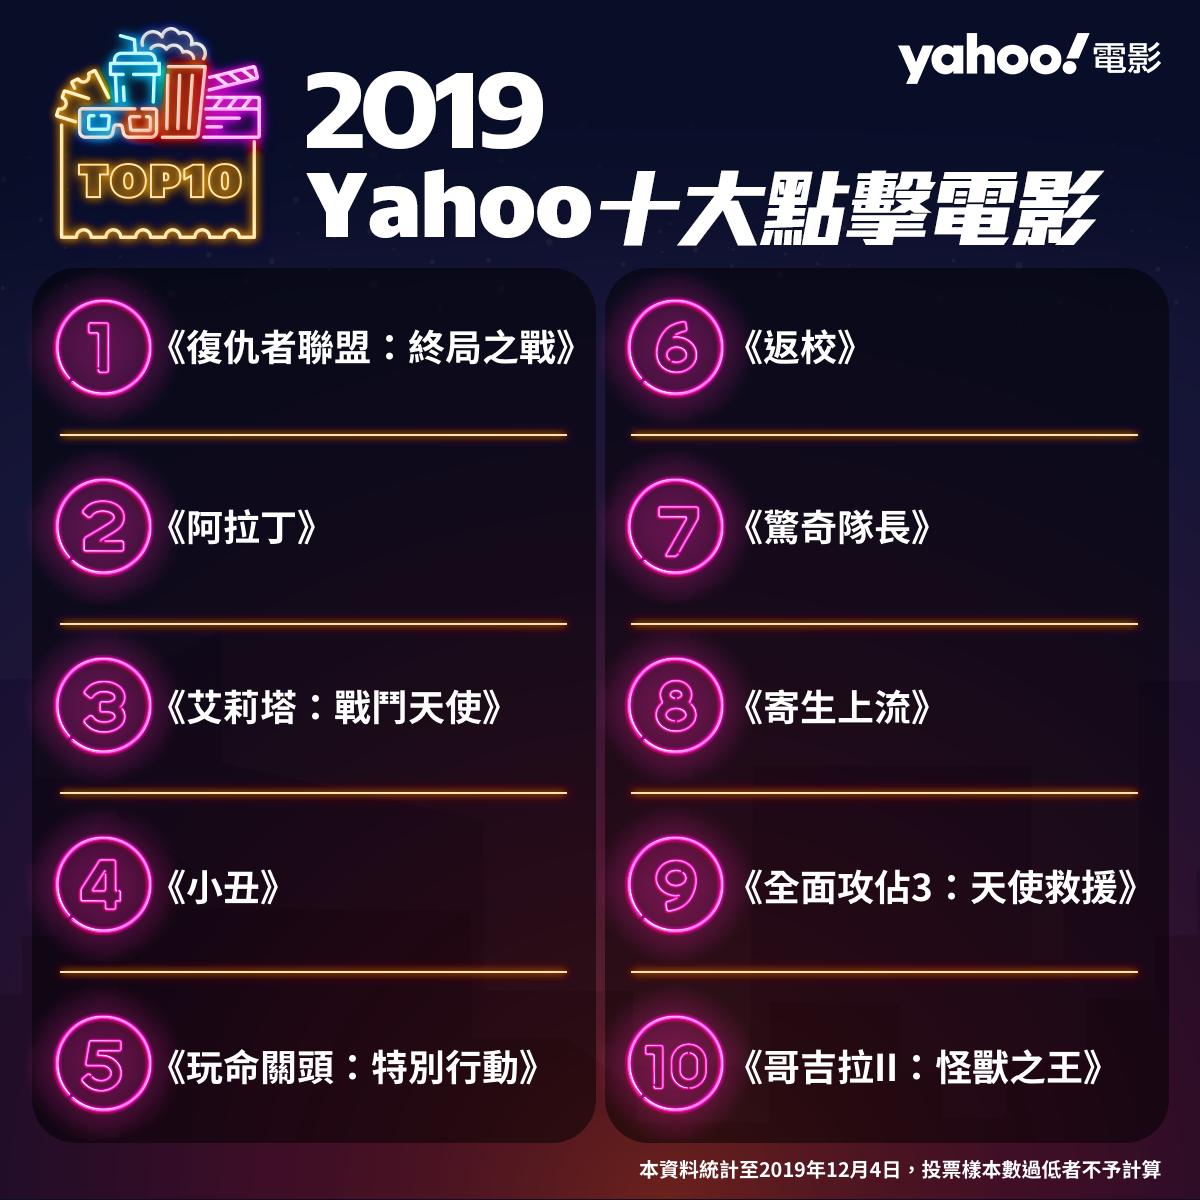 2019Yahoo十大點擊電影